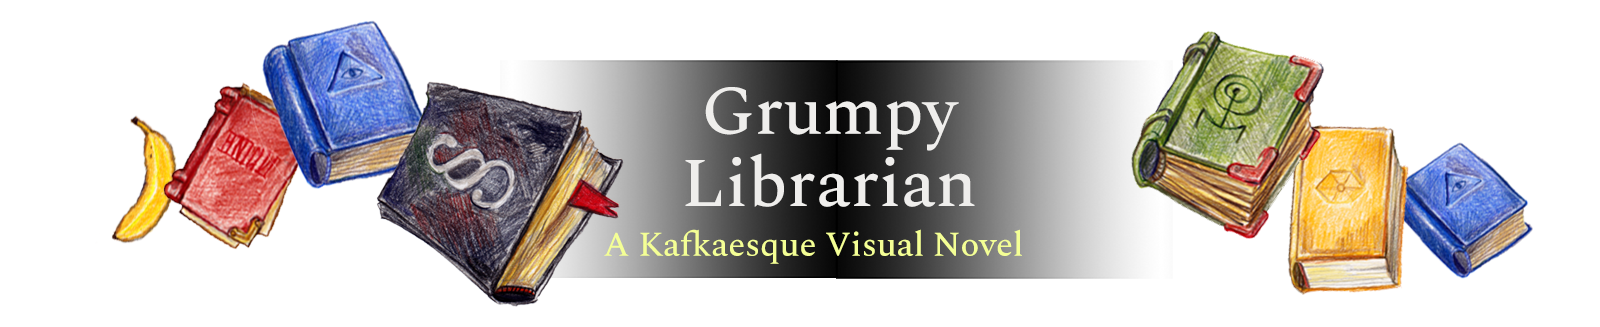 Grumpy Librarian